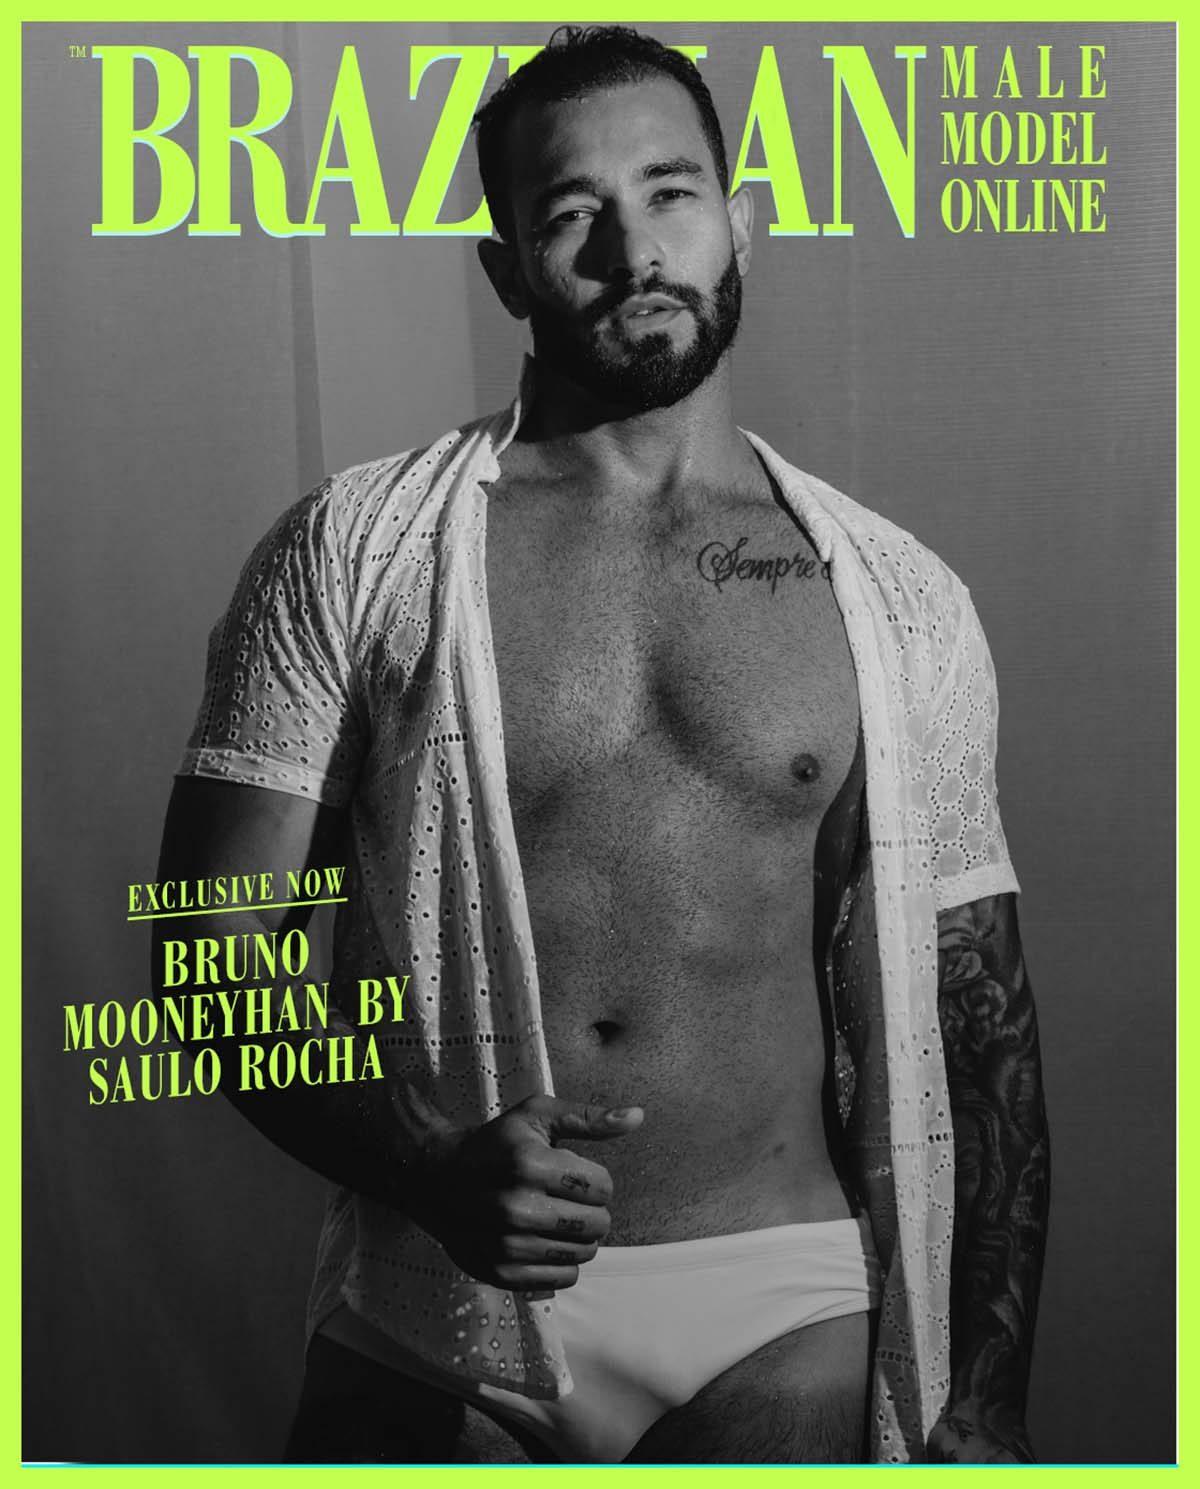 Bruno Mooneyhan by Saulo Rocha